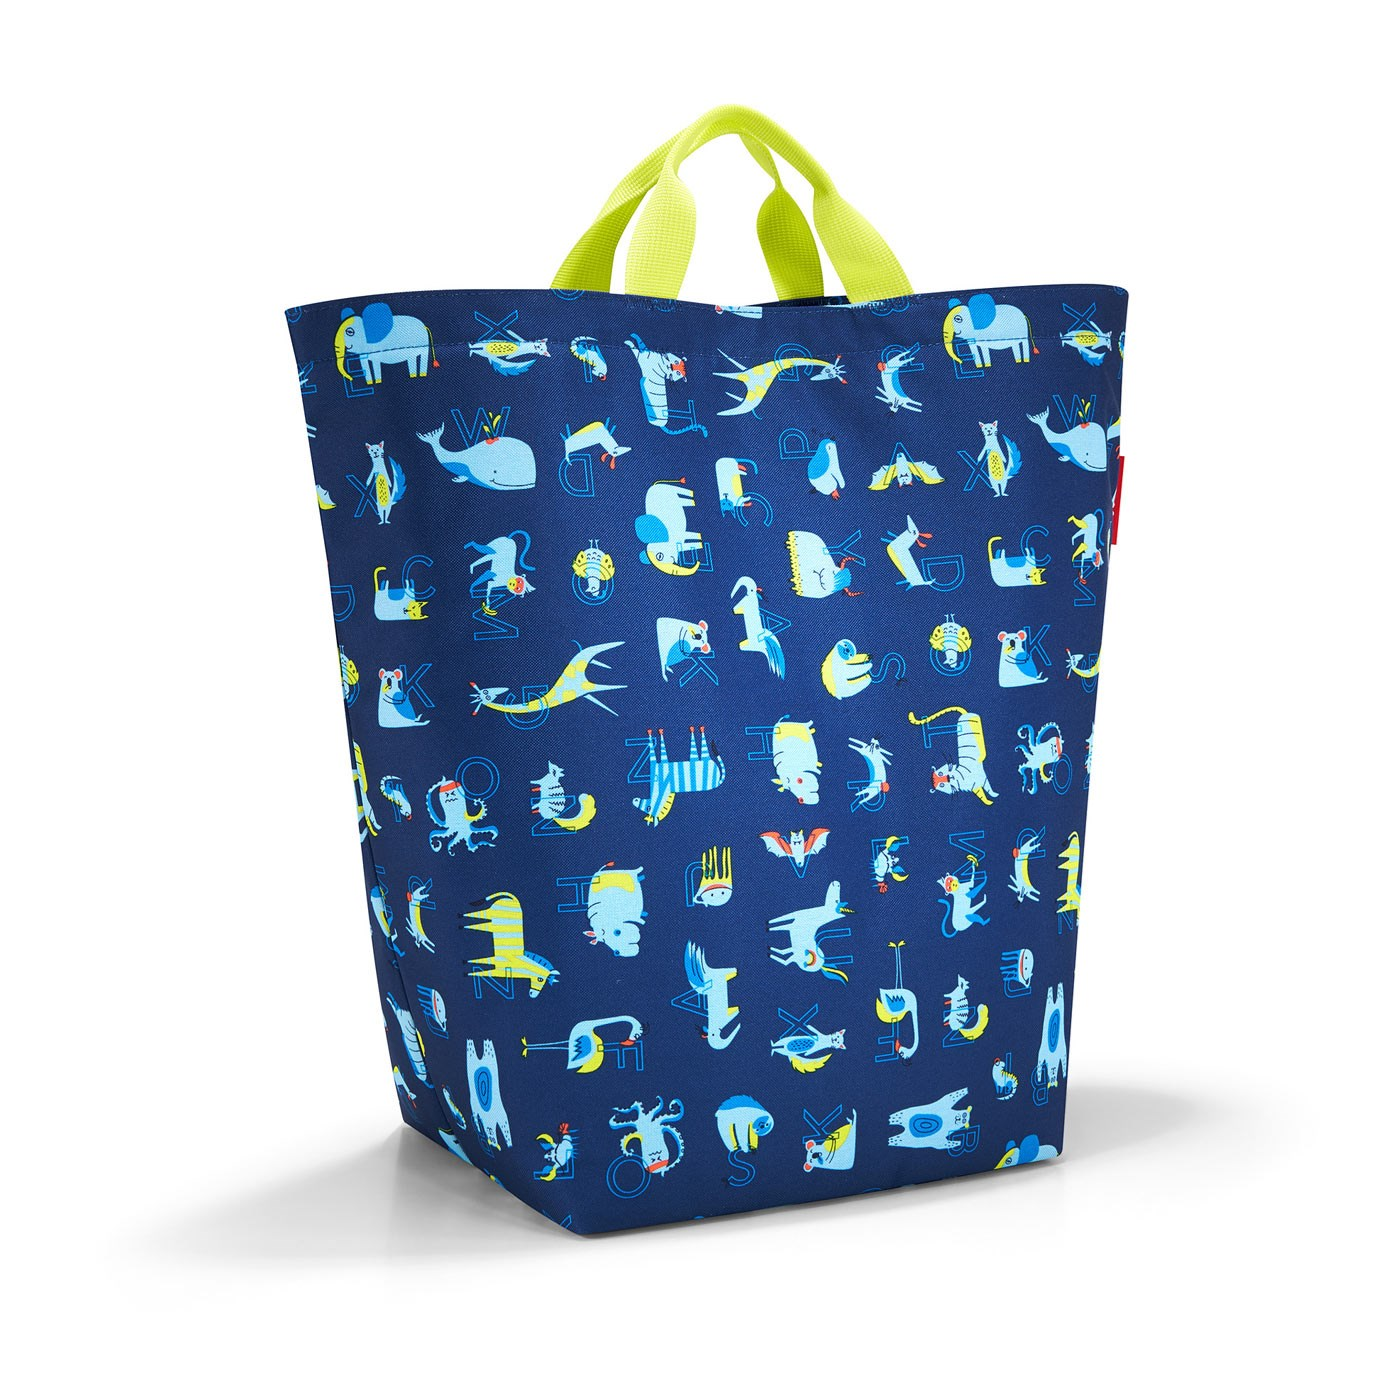 Taška na hračky Storagesac kids abc friends blue_2